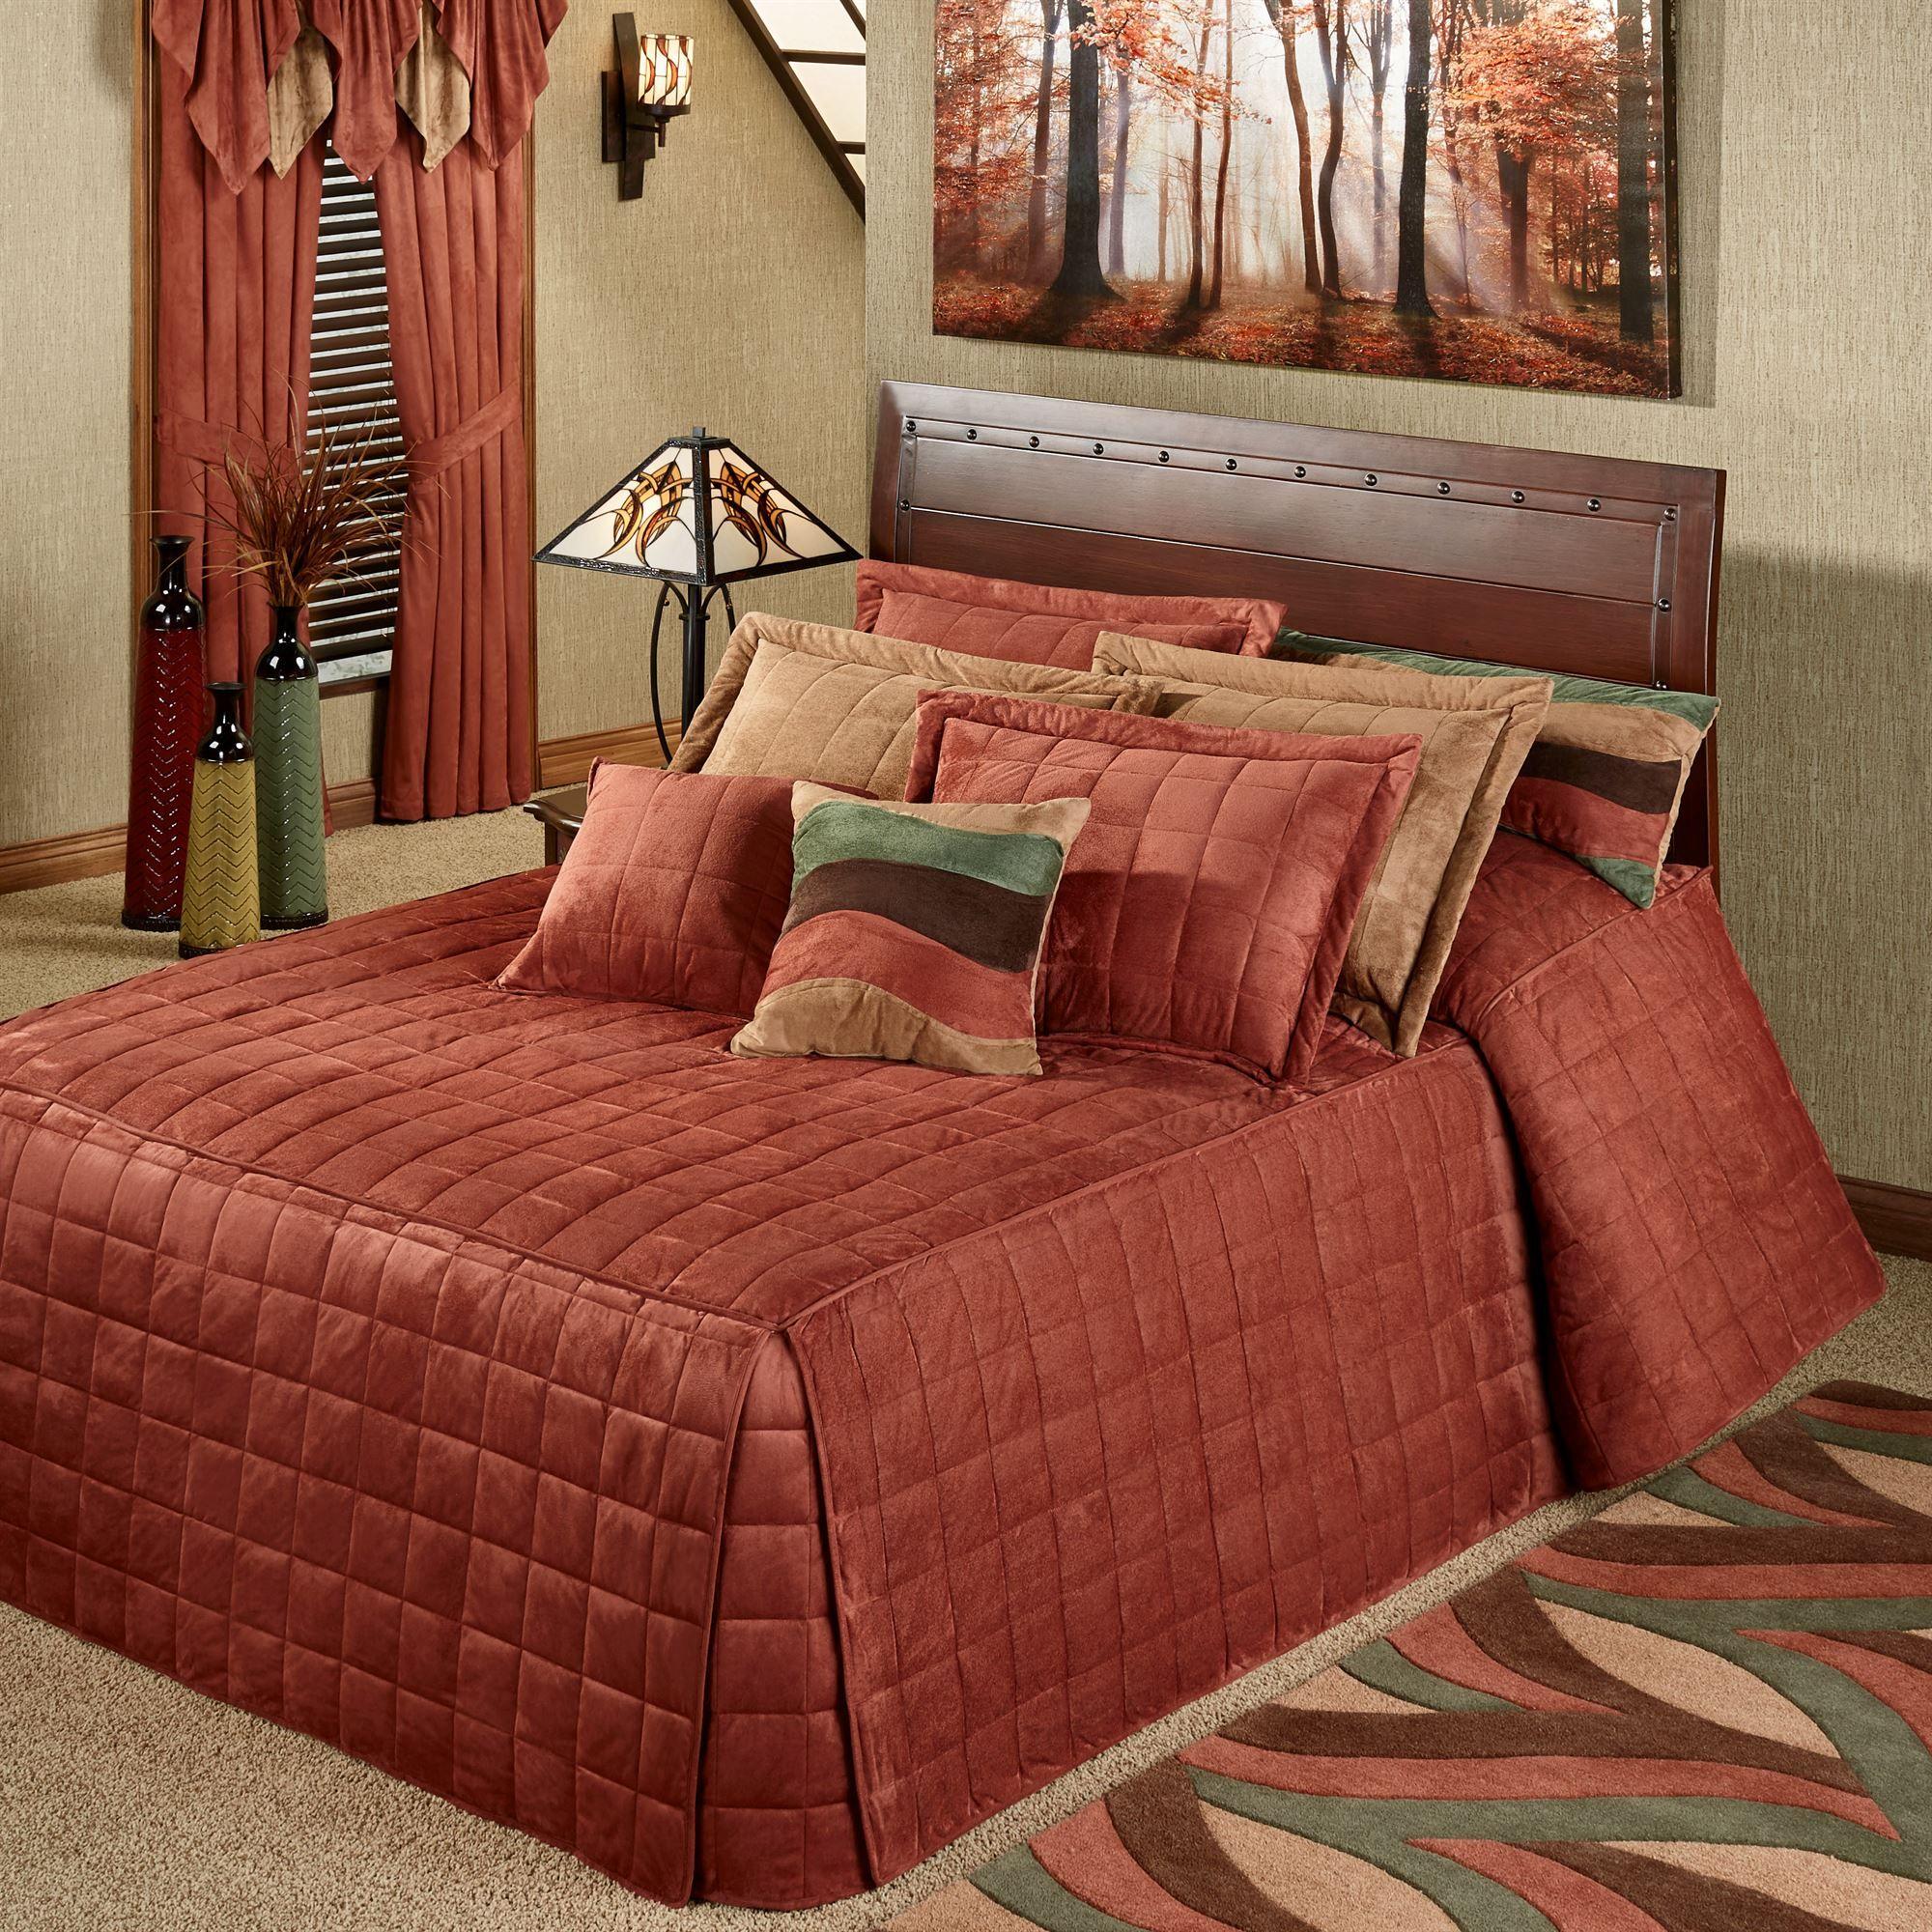 Camden Russet Grande Oversized Fitted Bedspread Bedding